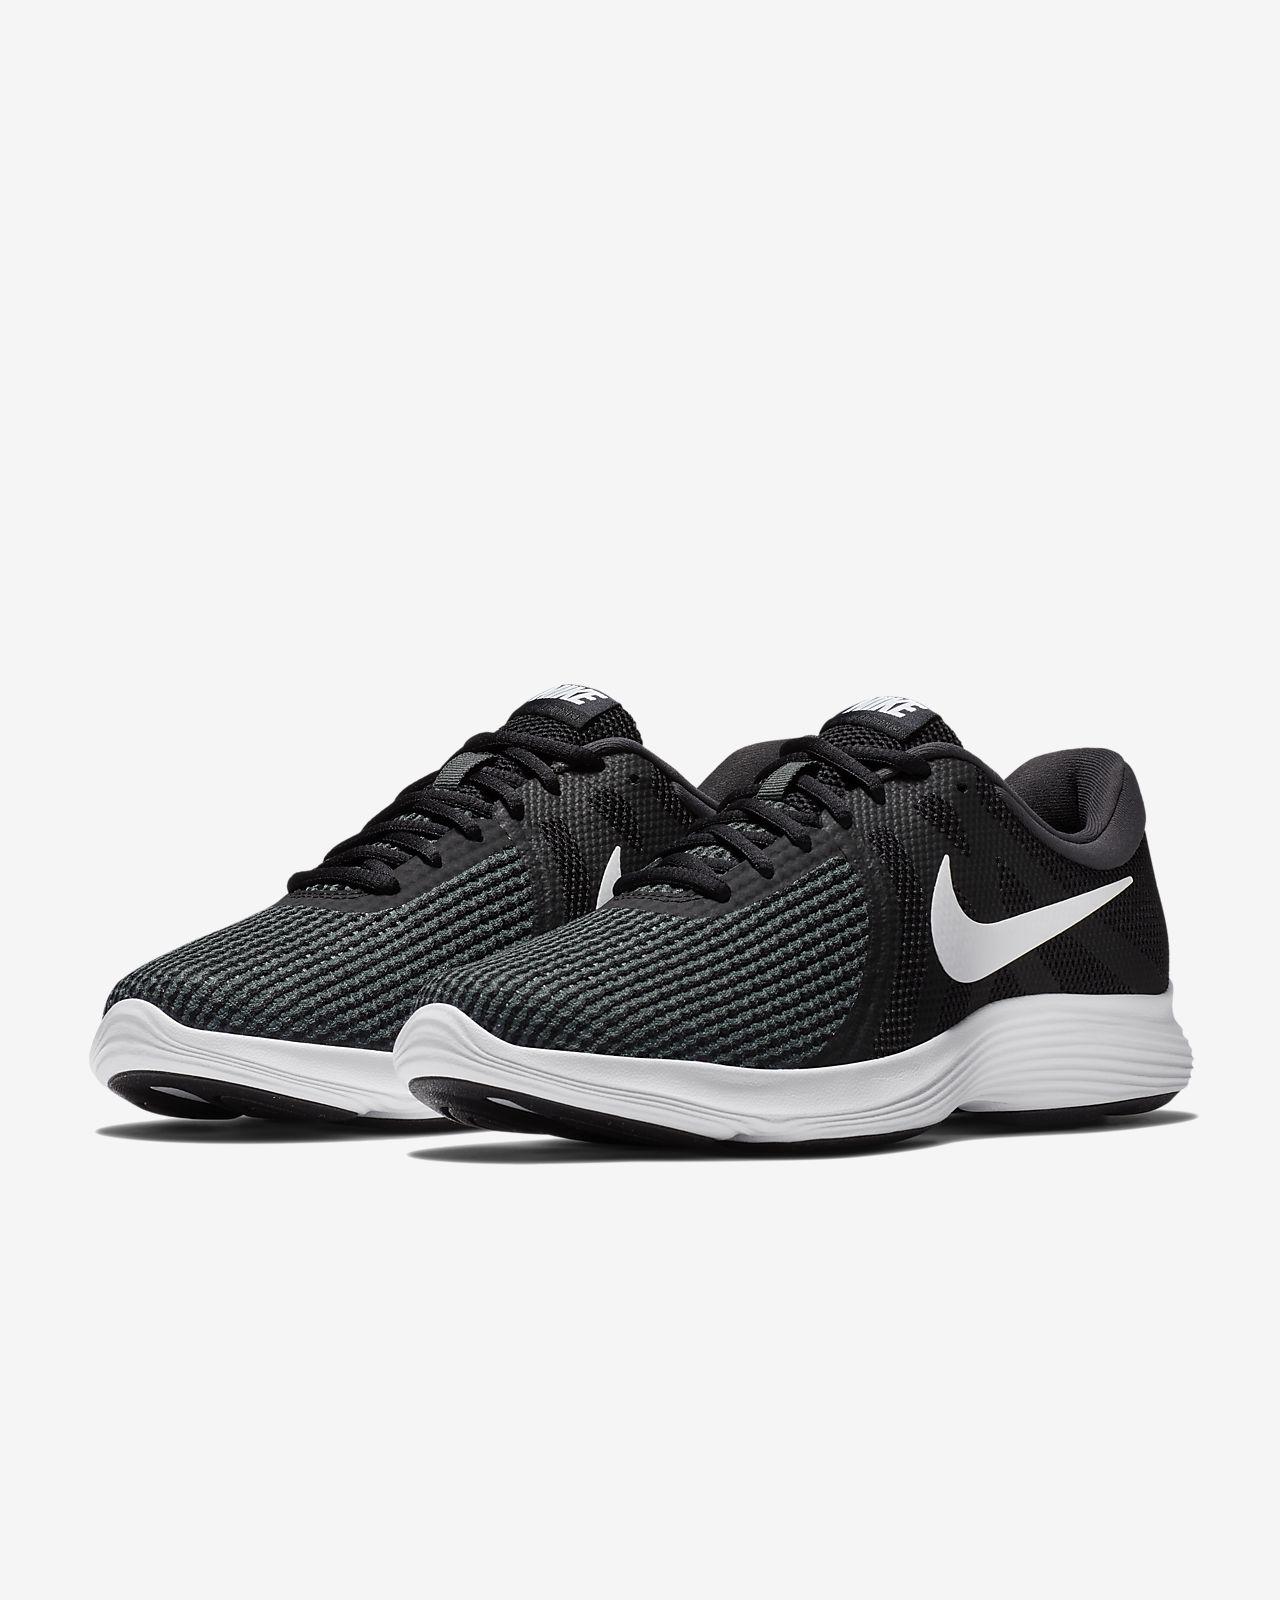 7953acd5fe Men's Nike Revolution 4 Running Shoe (EU). Nike.com GB